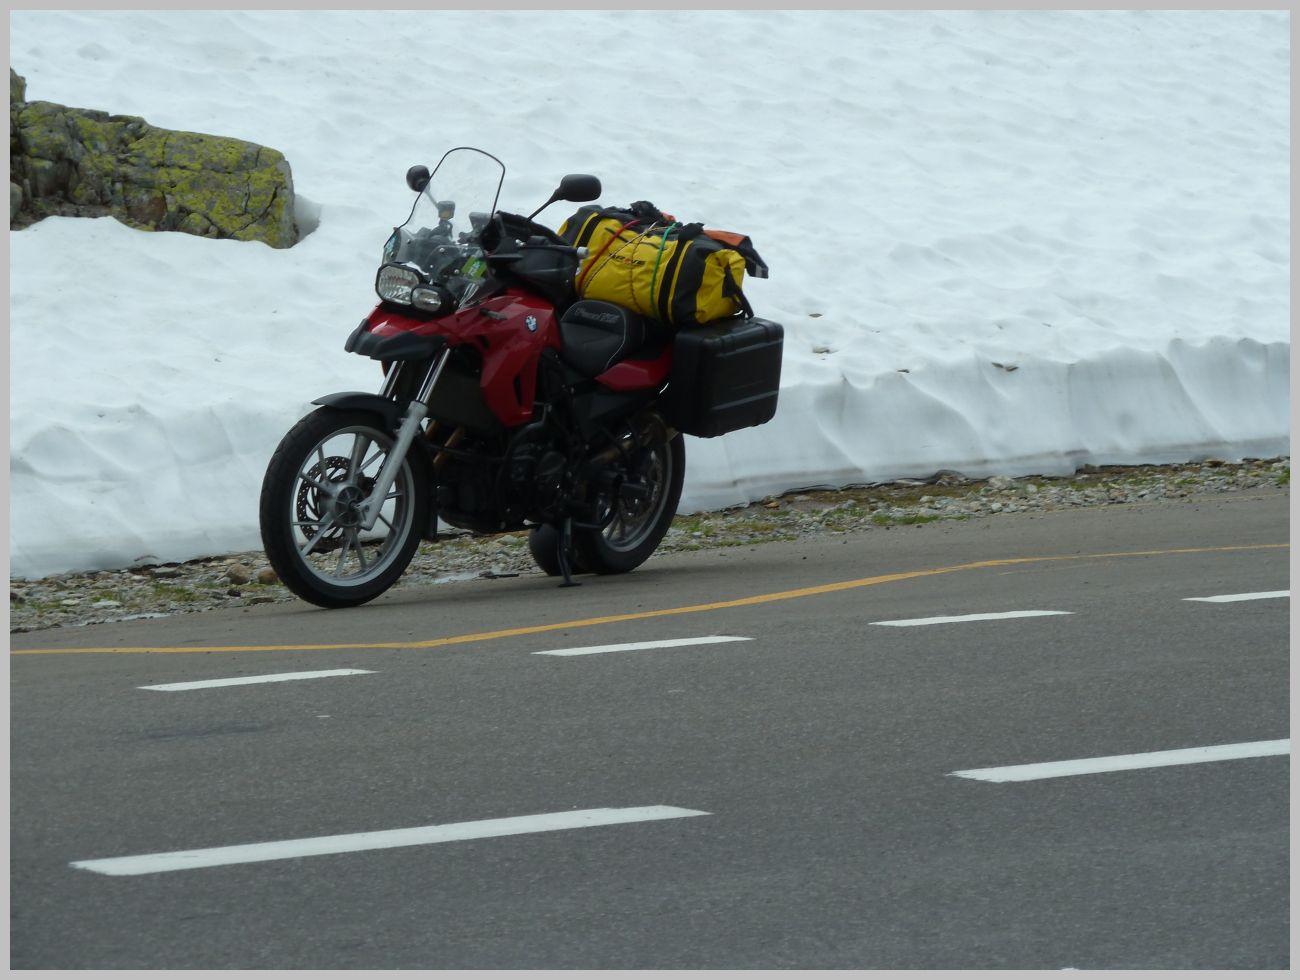 201206_Korsika_Moped011